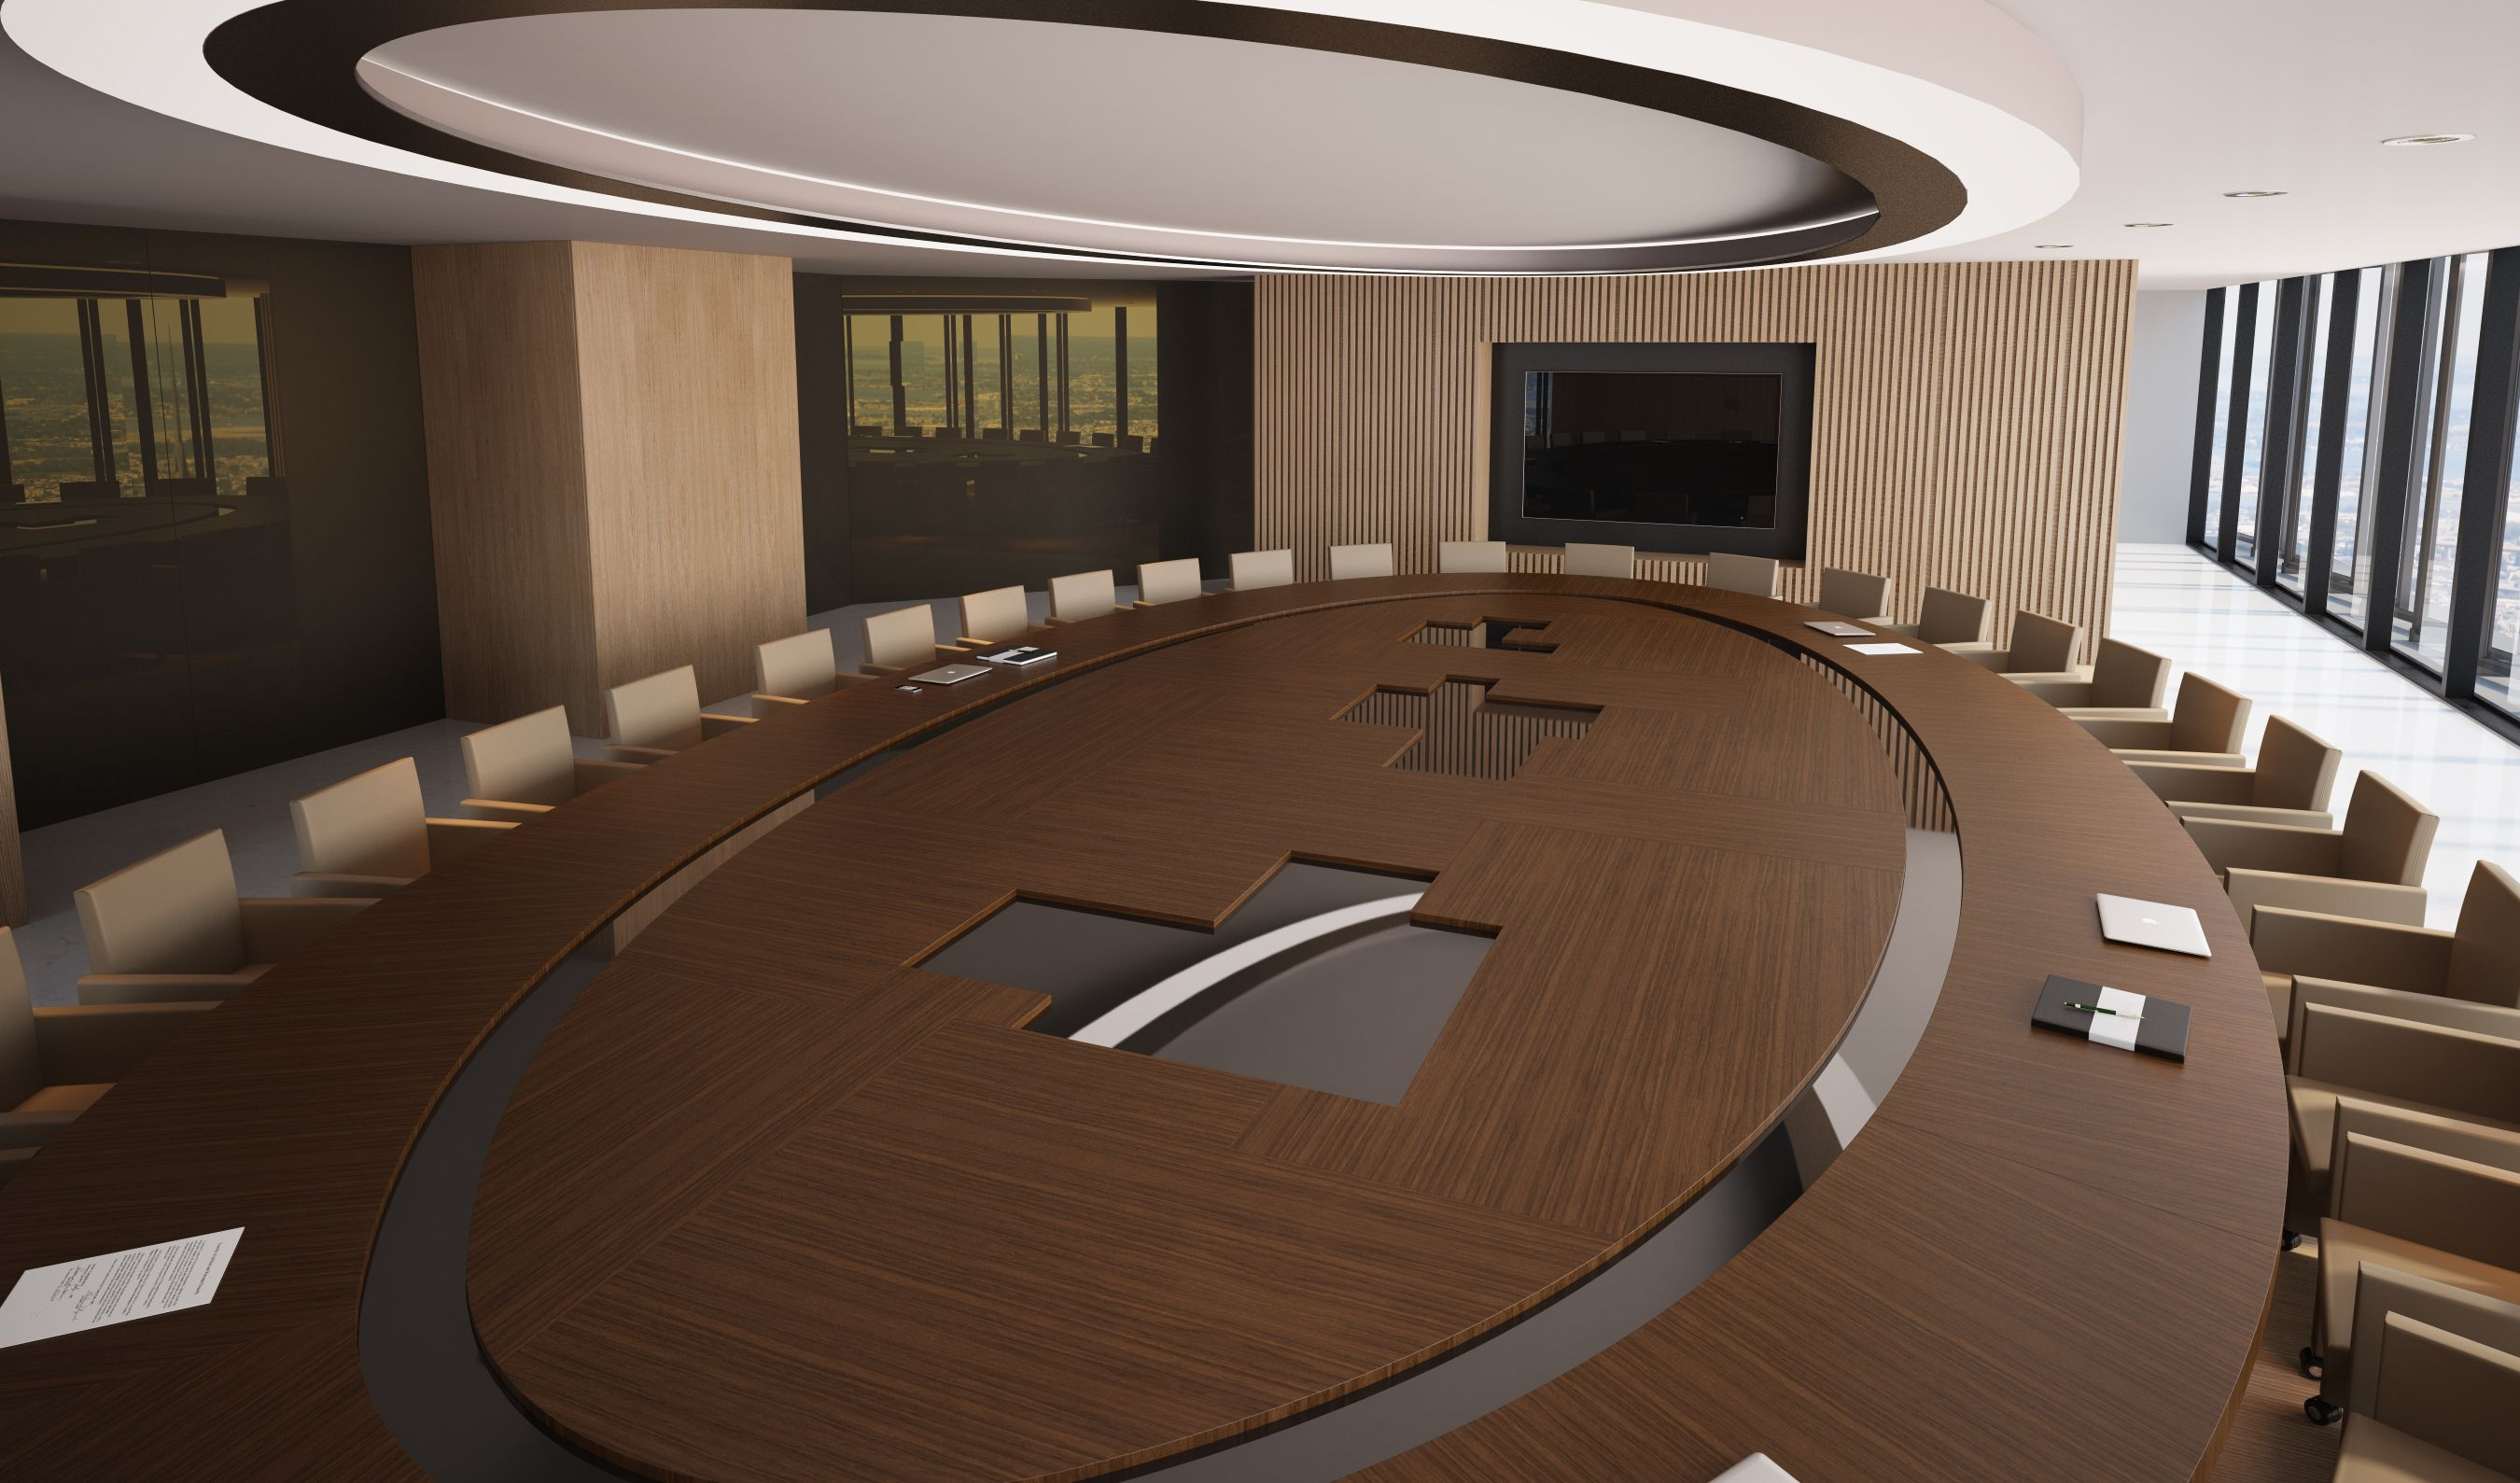 impromptu oval office meeting - HD2700×1589